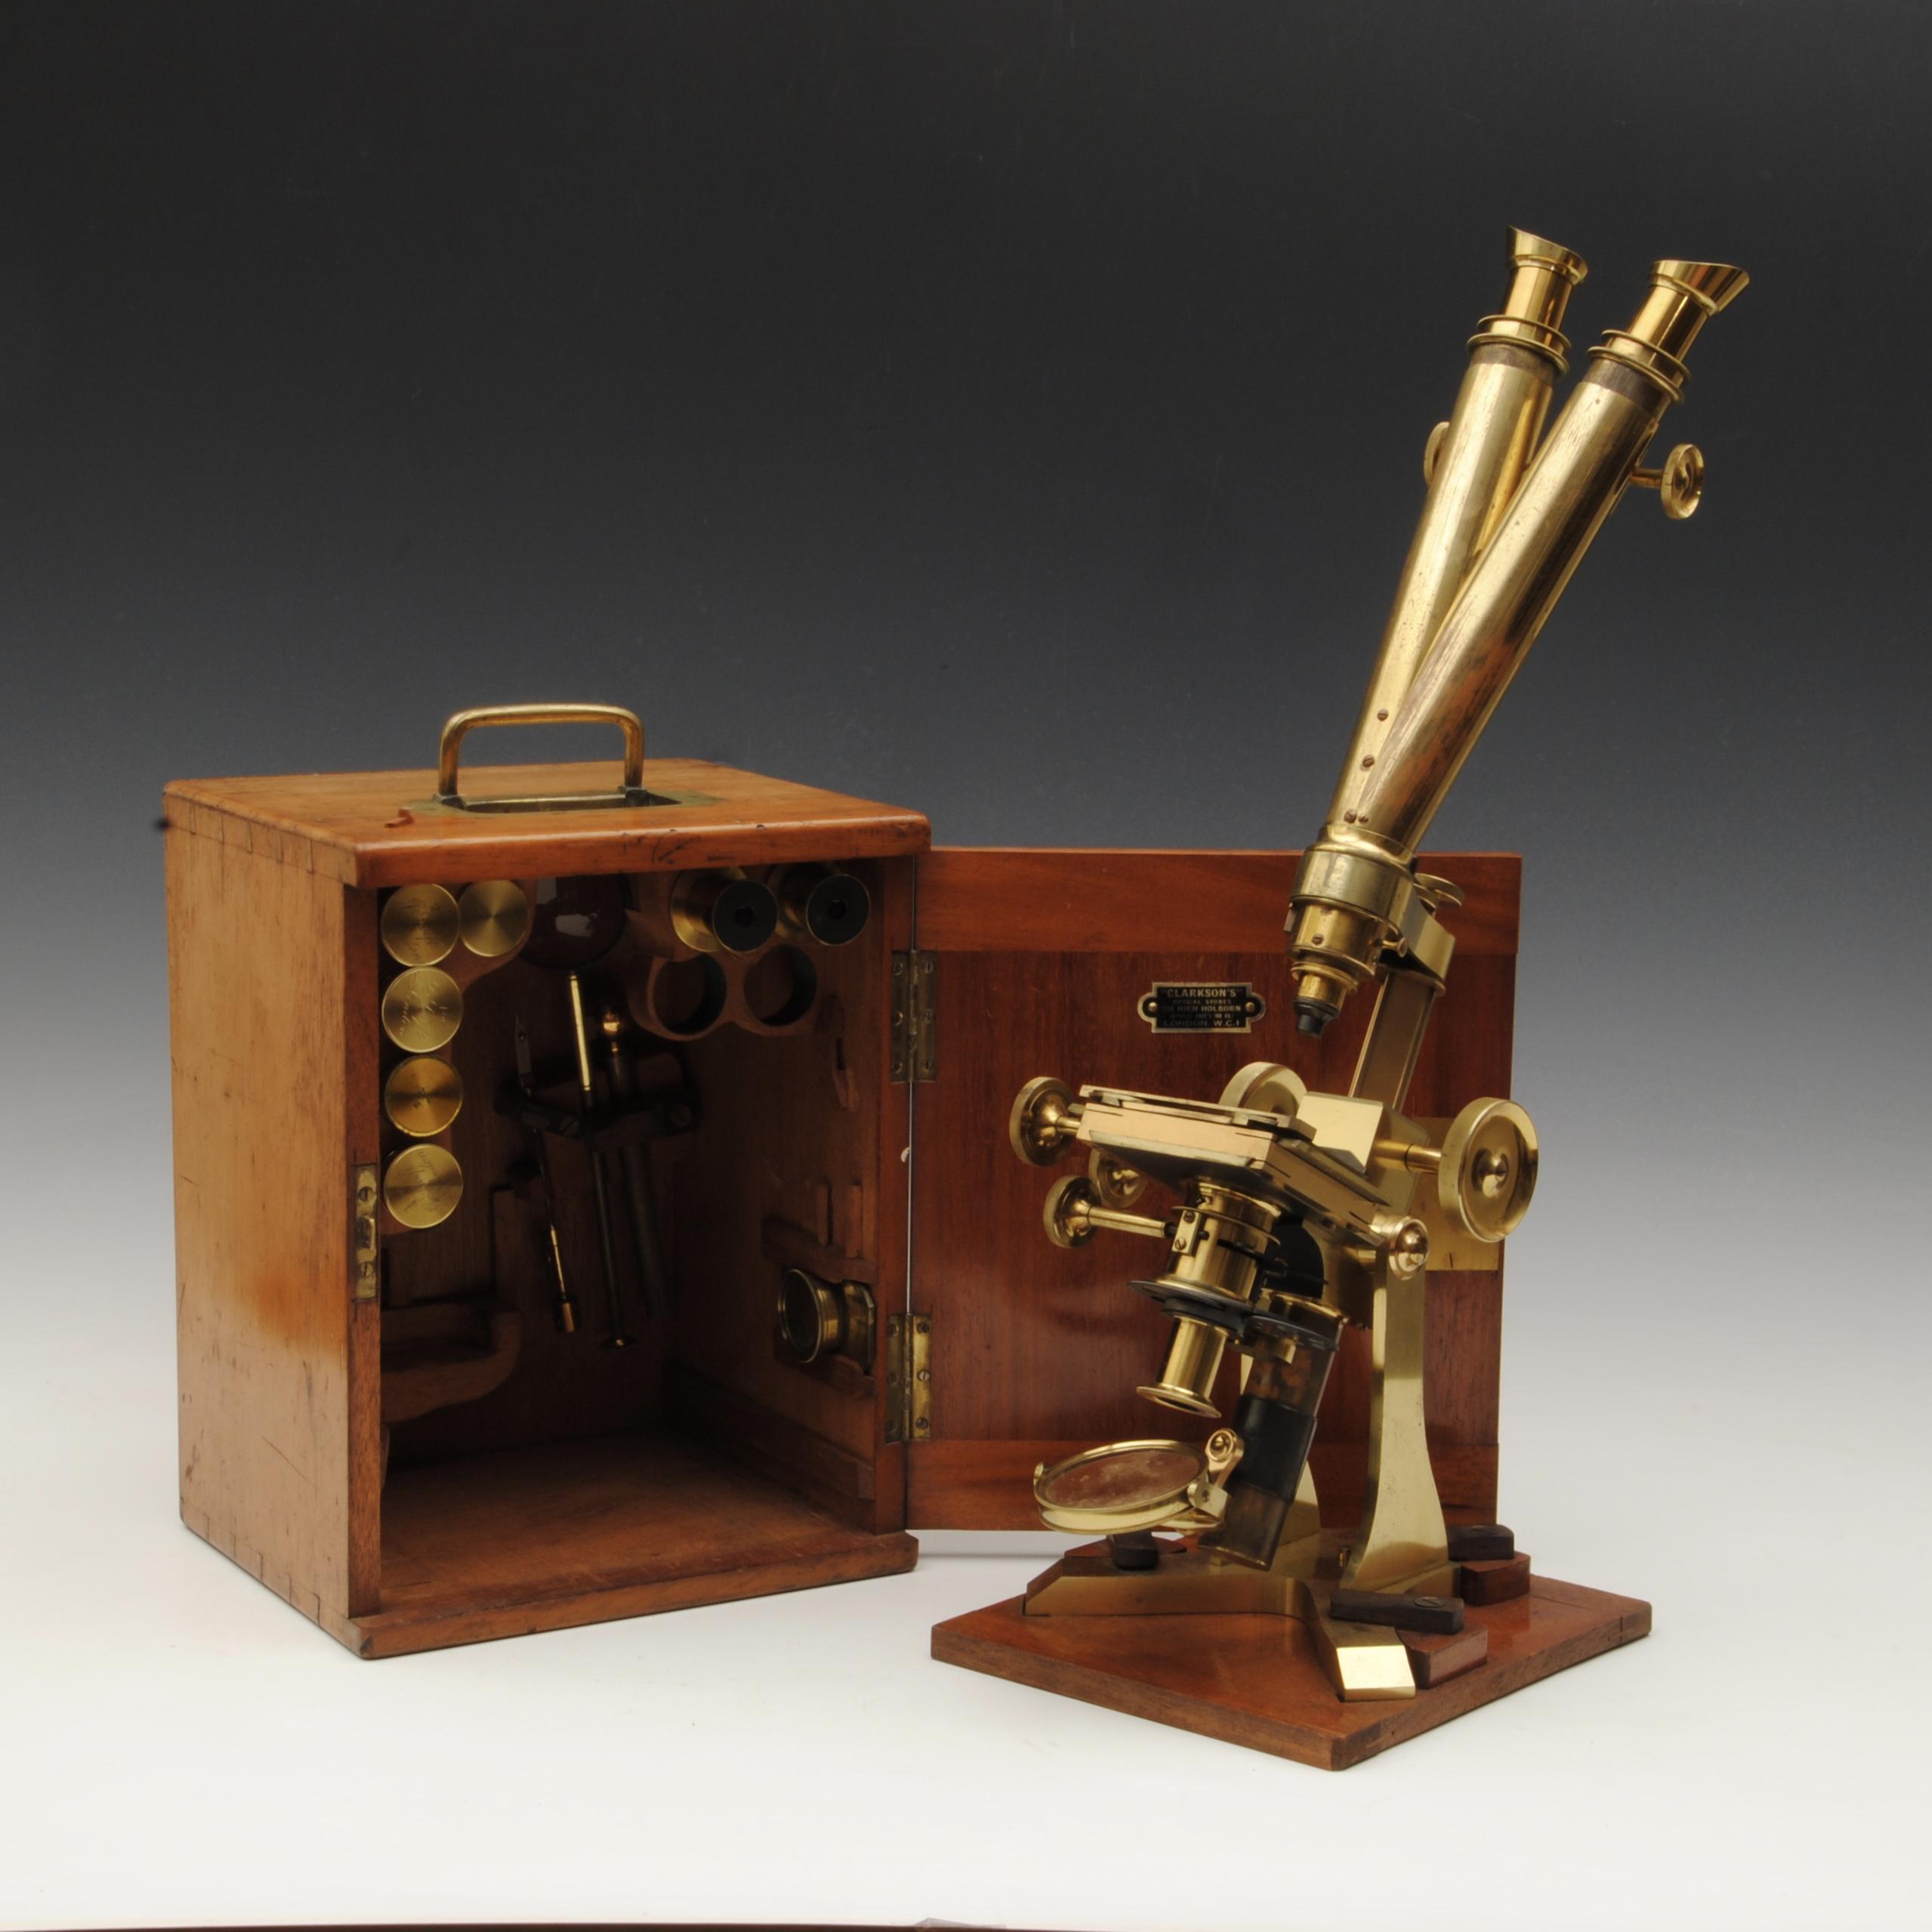 A fine 19th century binocular compound microscope by Swift London